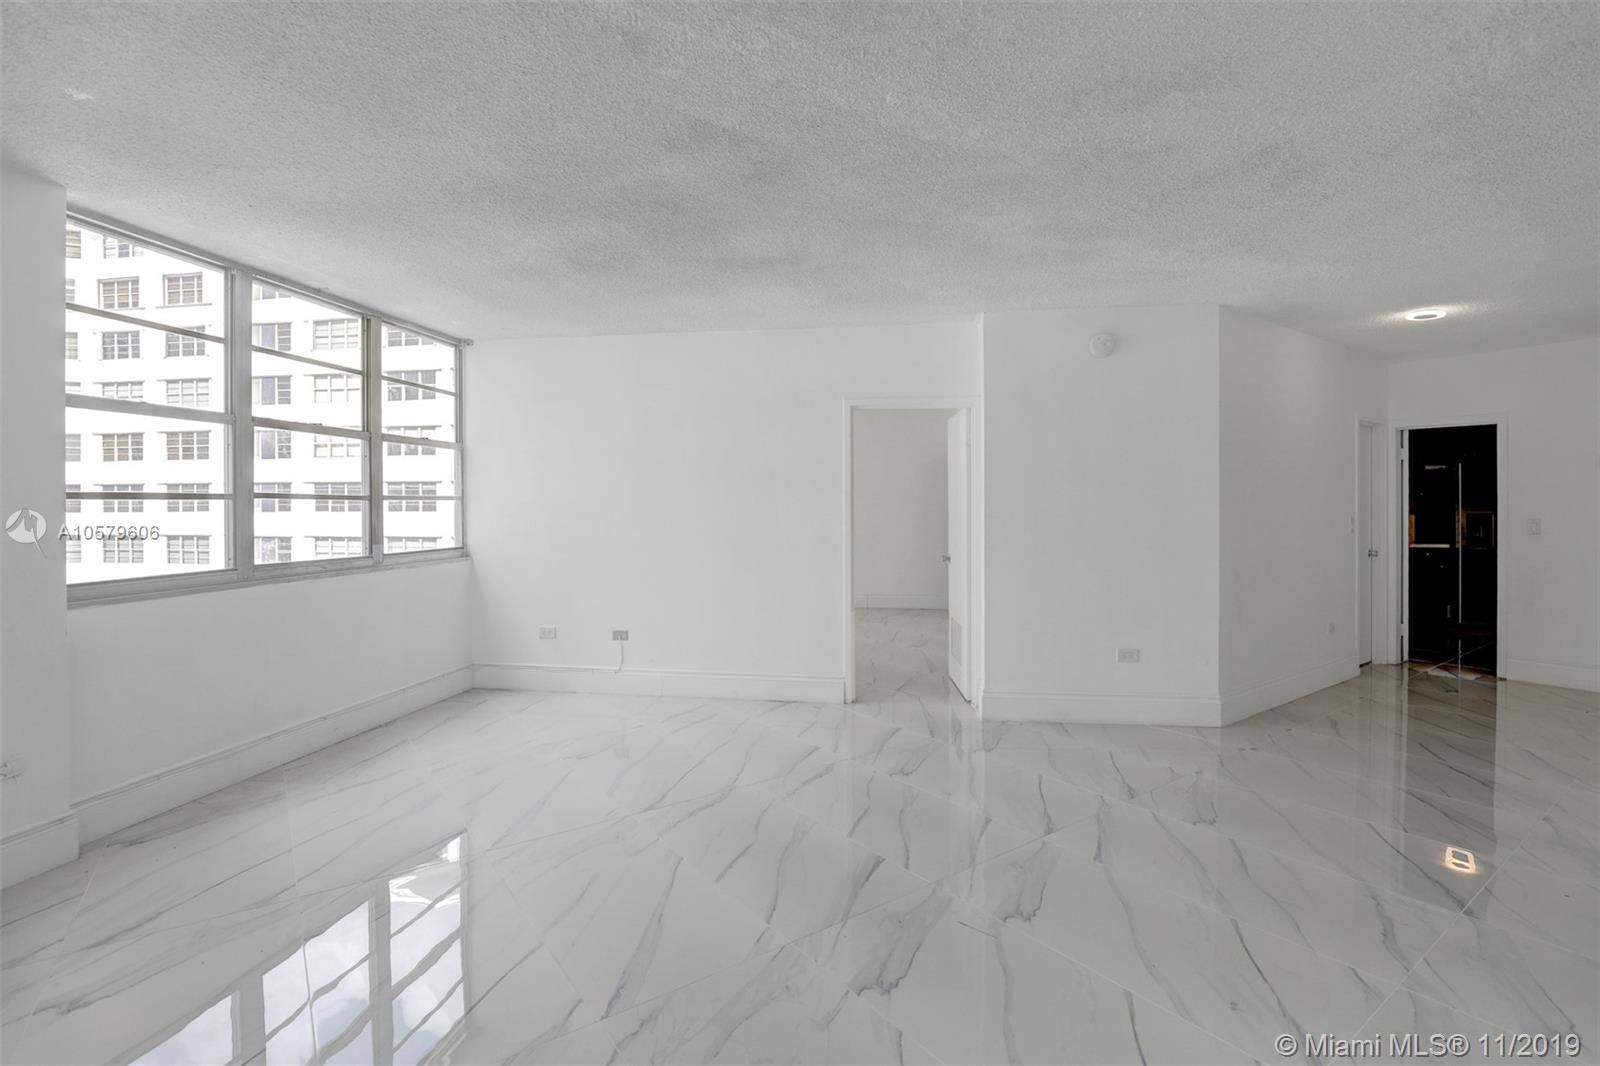 905 Brickell Bay Drive, Miami, FL 33131, Four Ambassadors #1524, Brickell, Miami A10579606 image #6